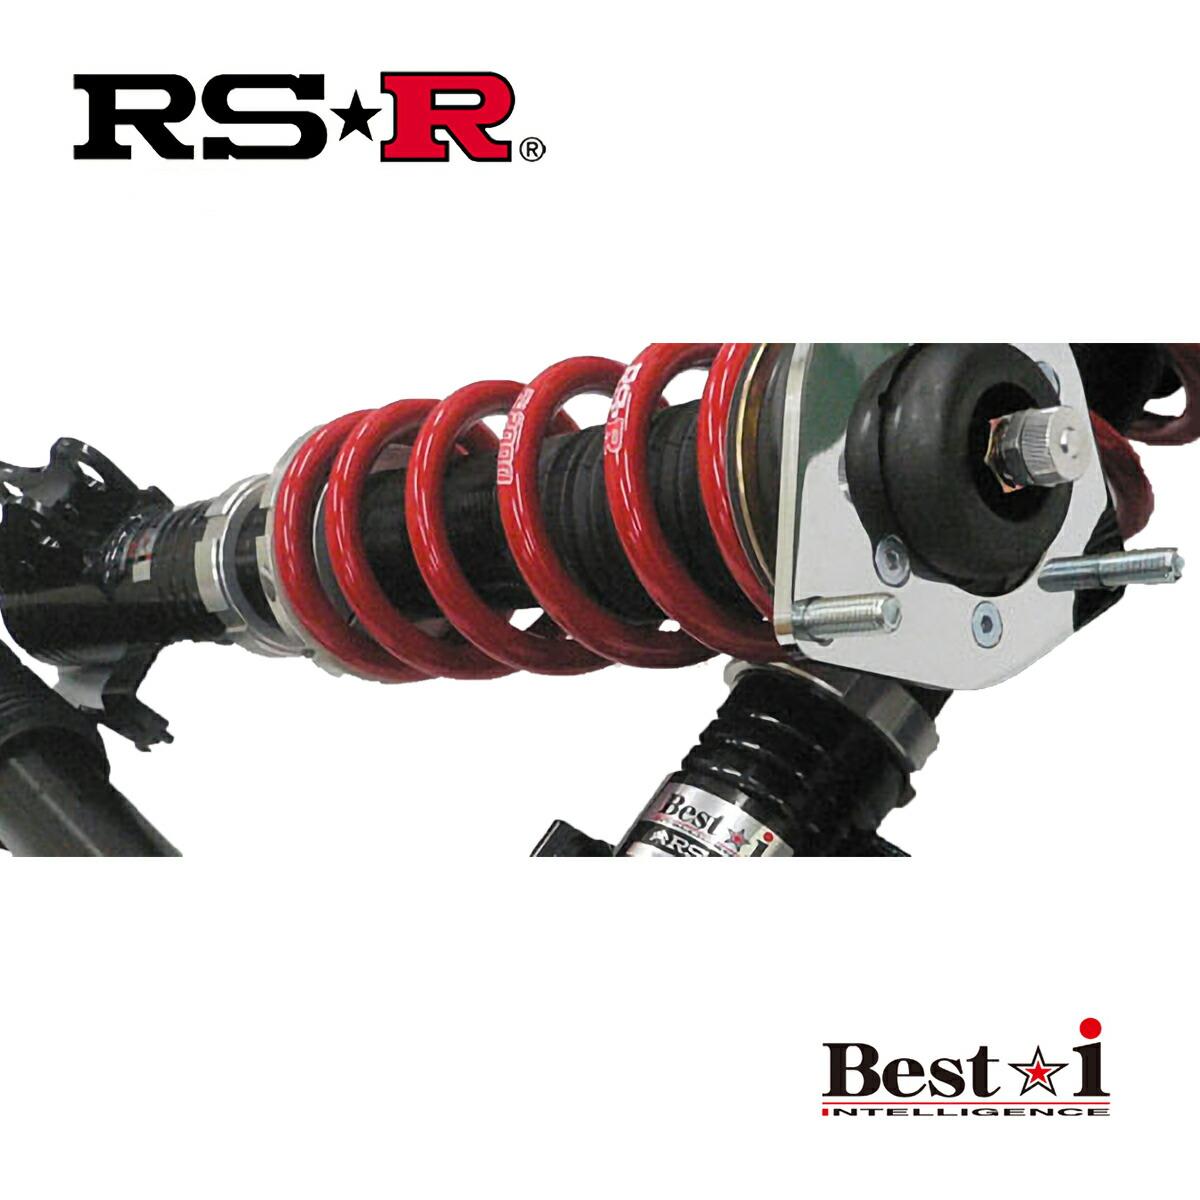 RS-R RAV4 MXAA54 車高調 リア車高調整: ネジ式 BIT078M ベストi RSR 個人宅発送追金有